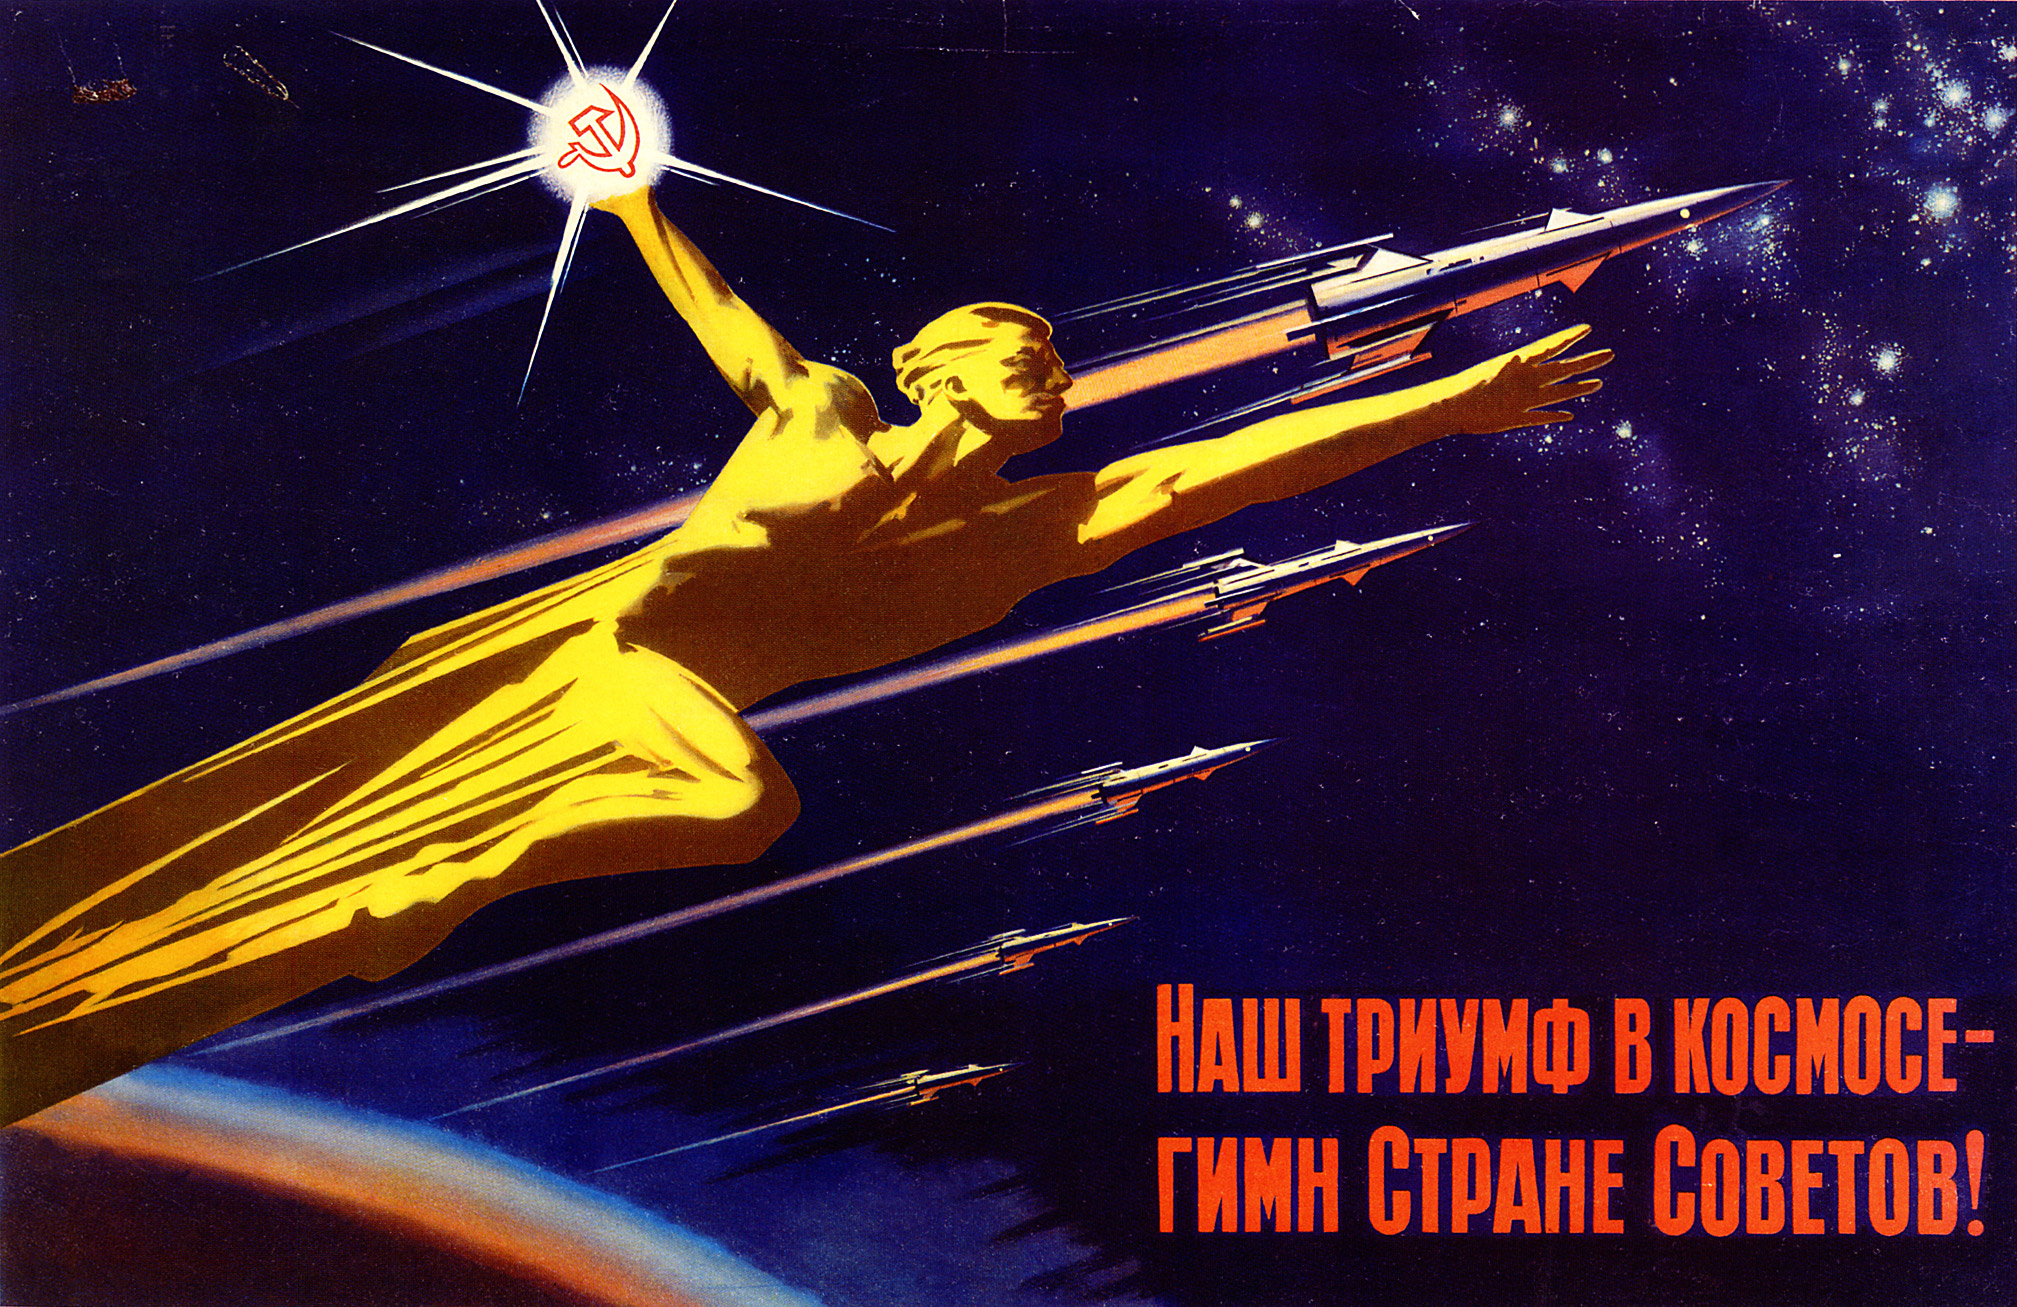 Soviet Space Propaganda Poster, 1950's